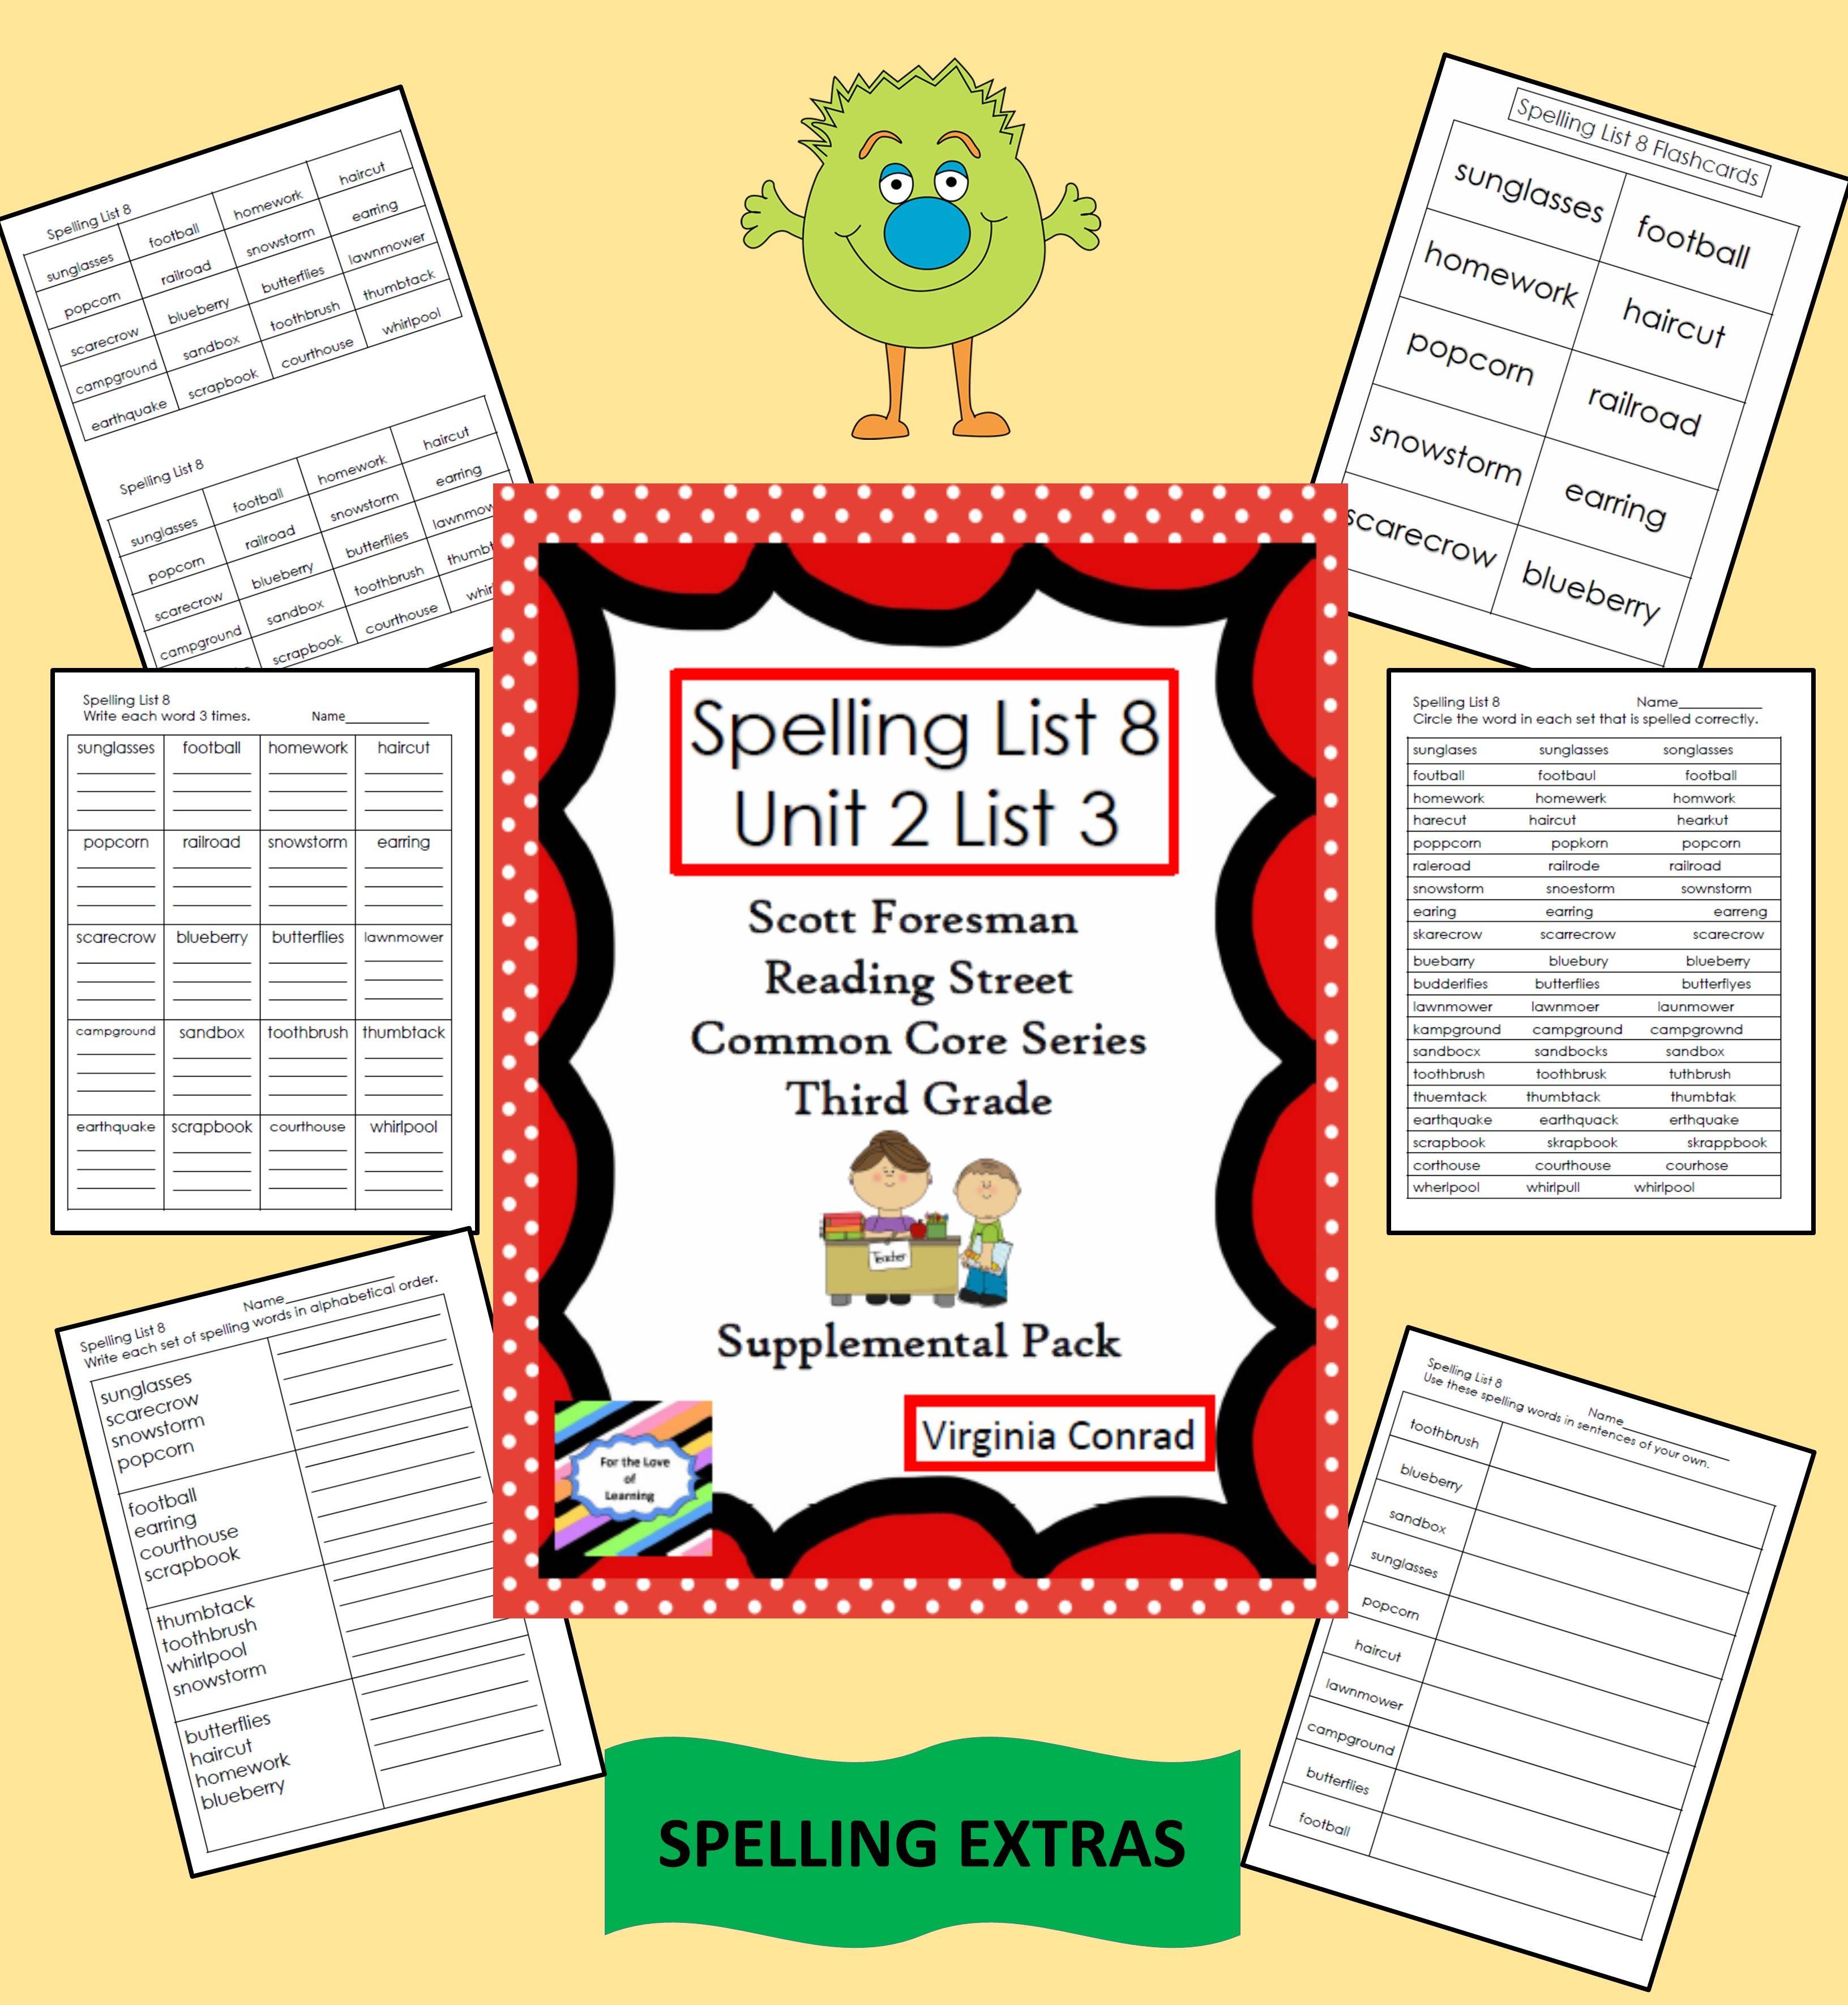 Supplemental Materials For Spelling List 8 Unit 2 List 2